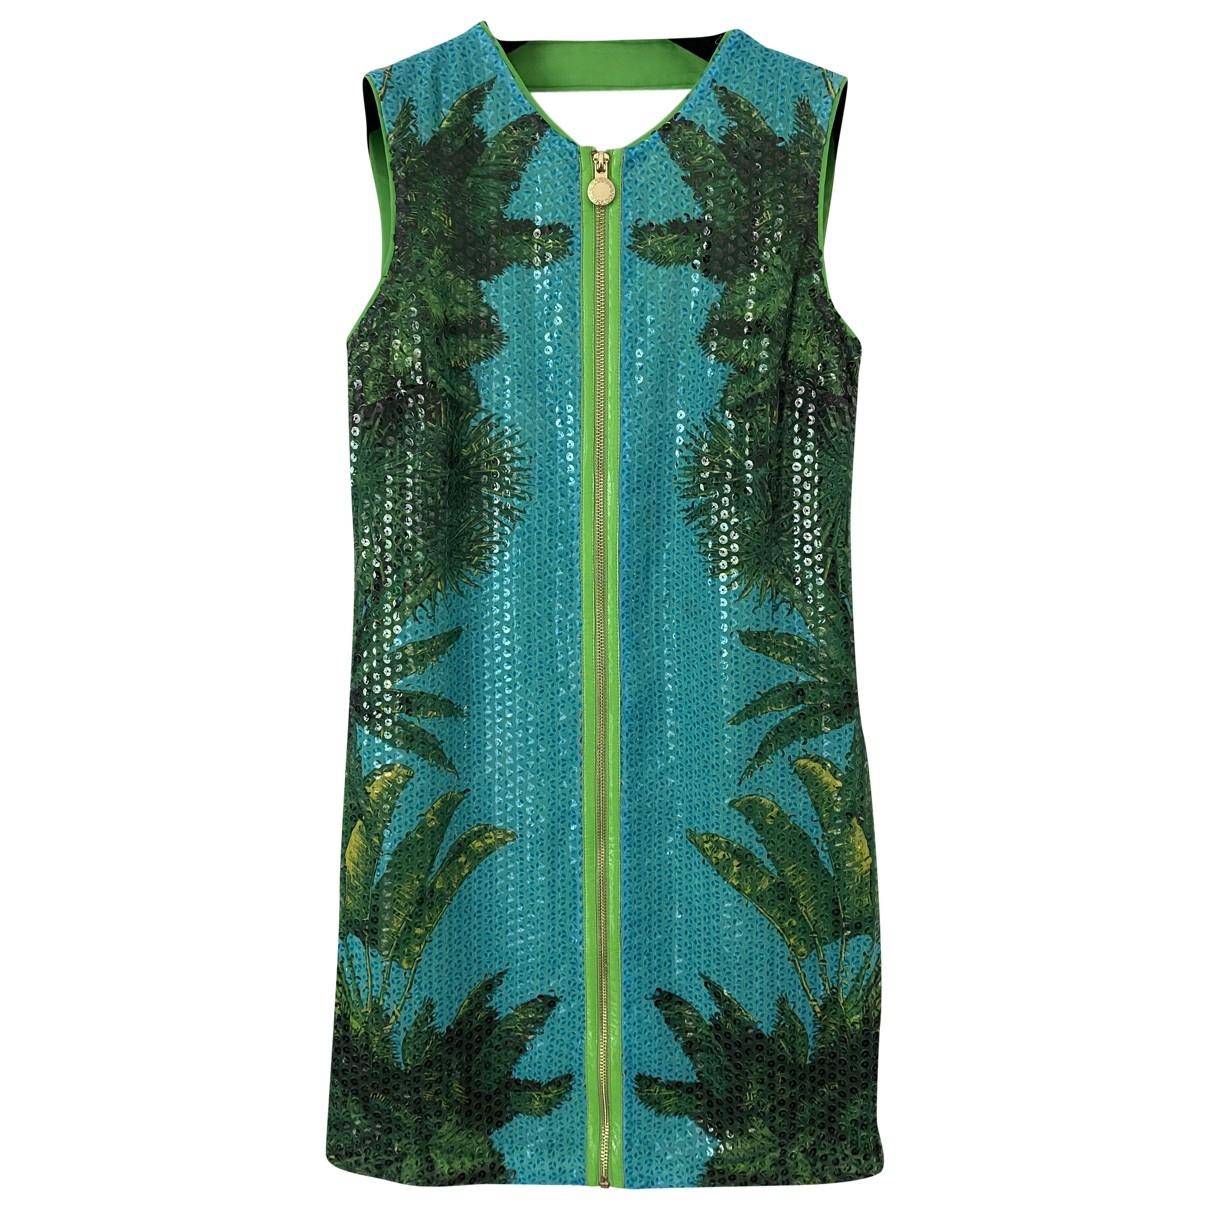 Versace X H&m \N Multicolour dress for Women 34 FR